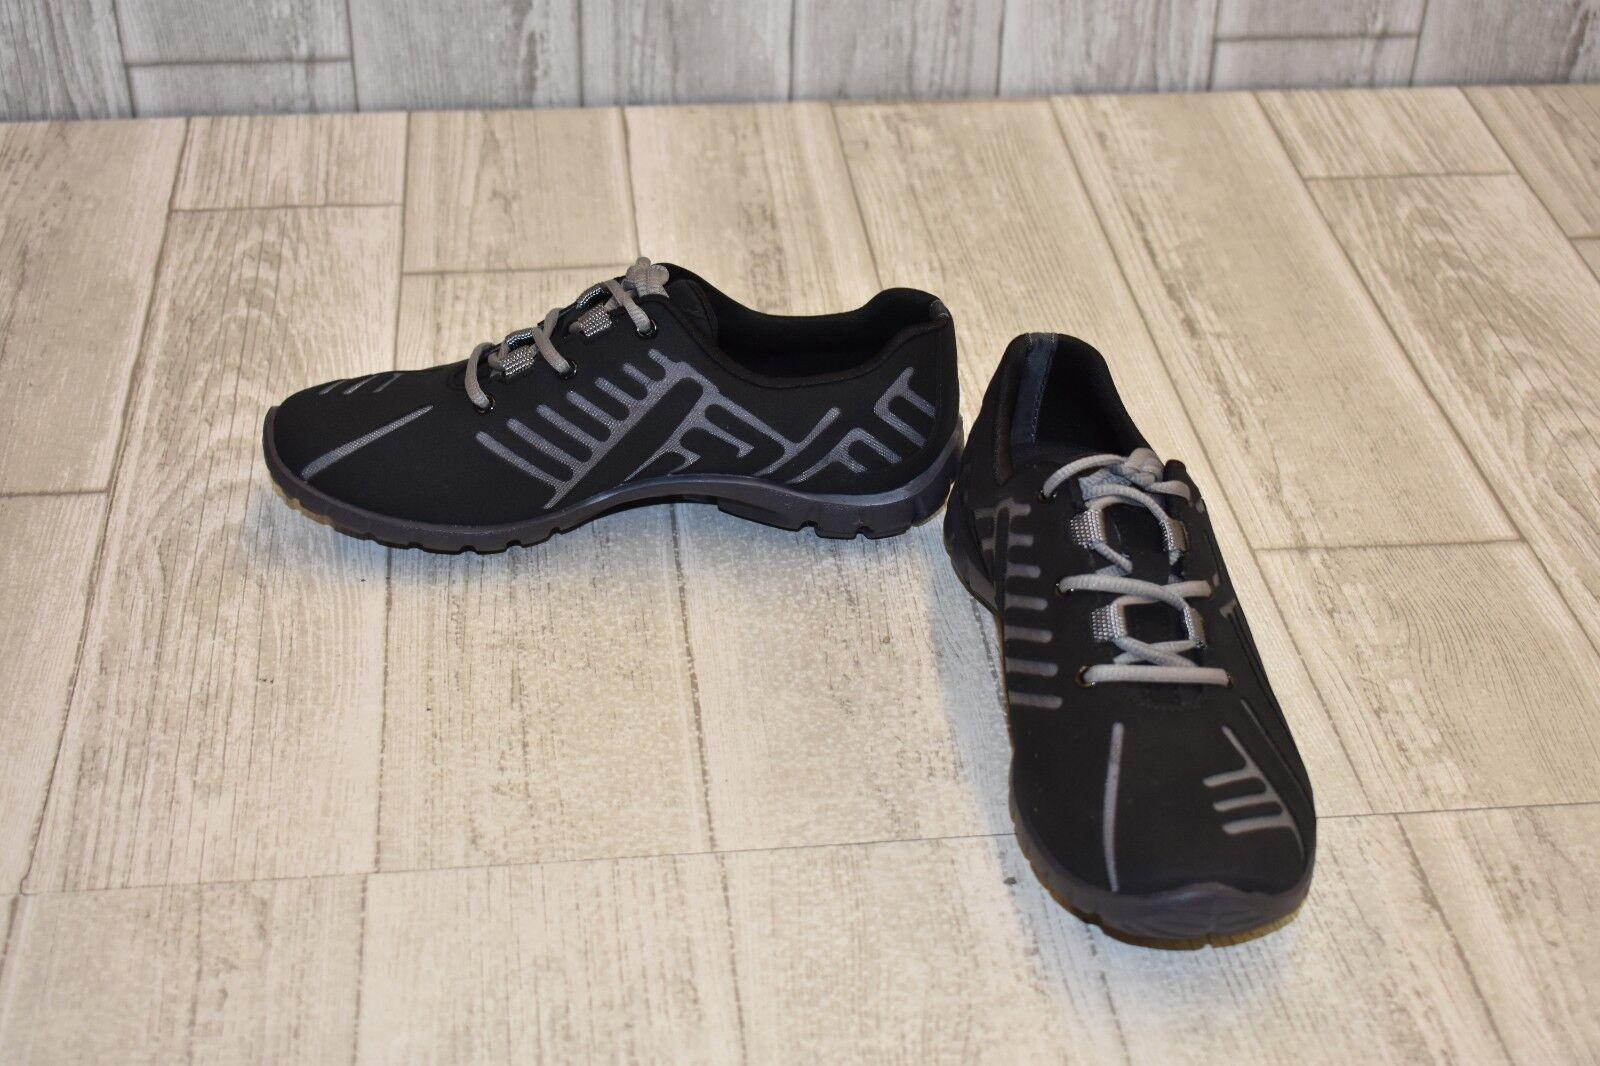 Rockport truWALKzero Welded Welded Welded Lace Up scarpe - Donna  Dimensione 5.5 W - nero 1b6600